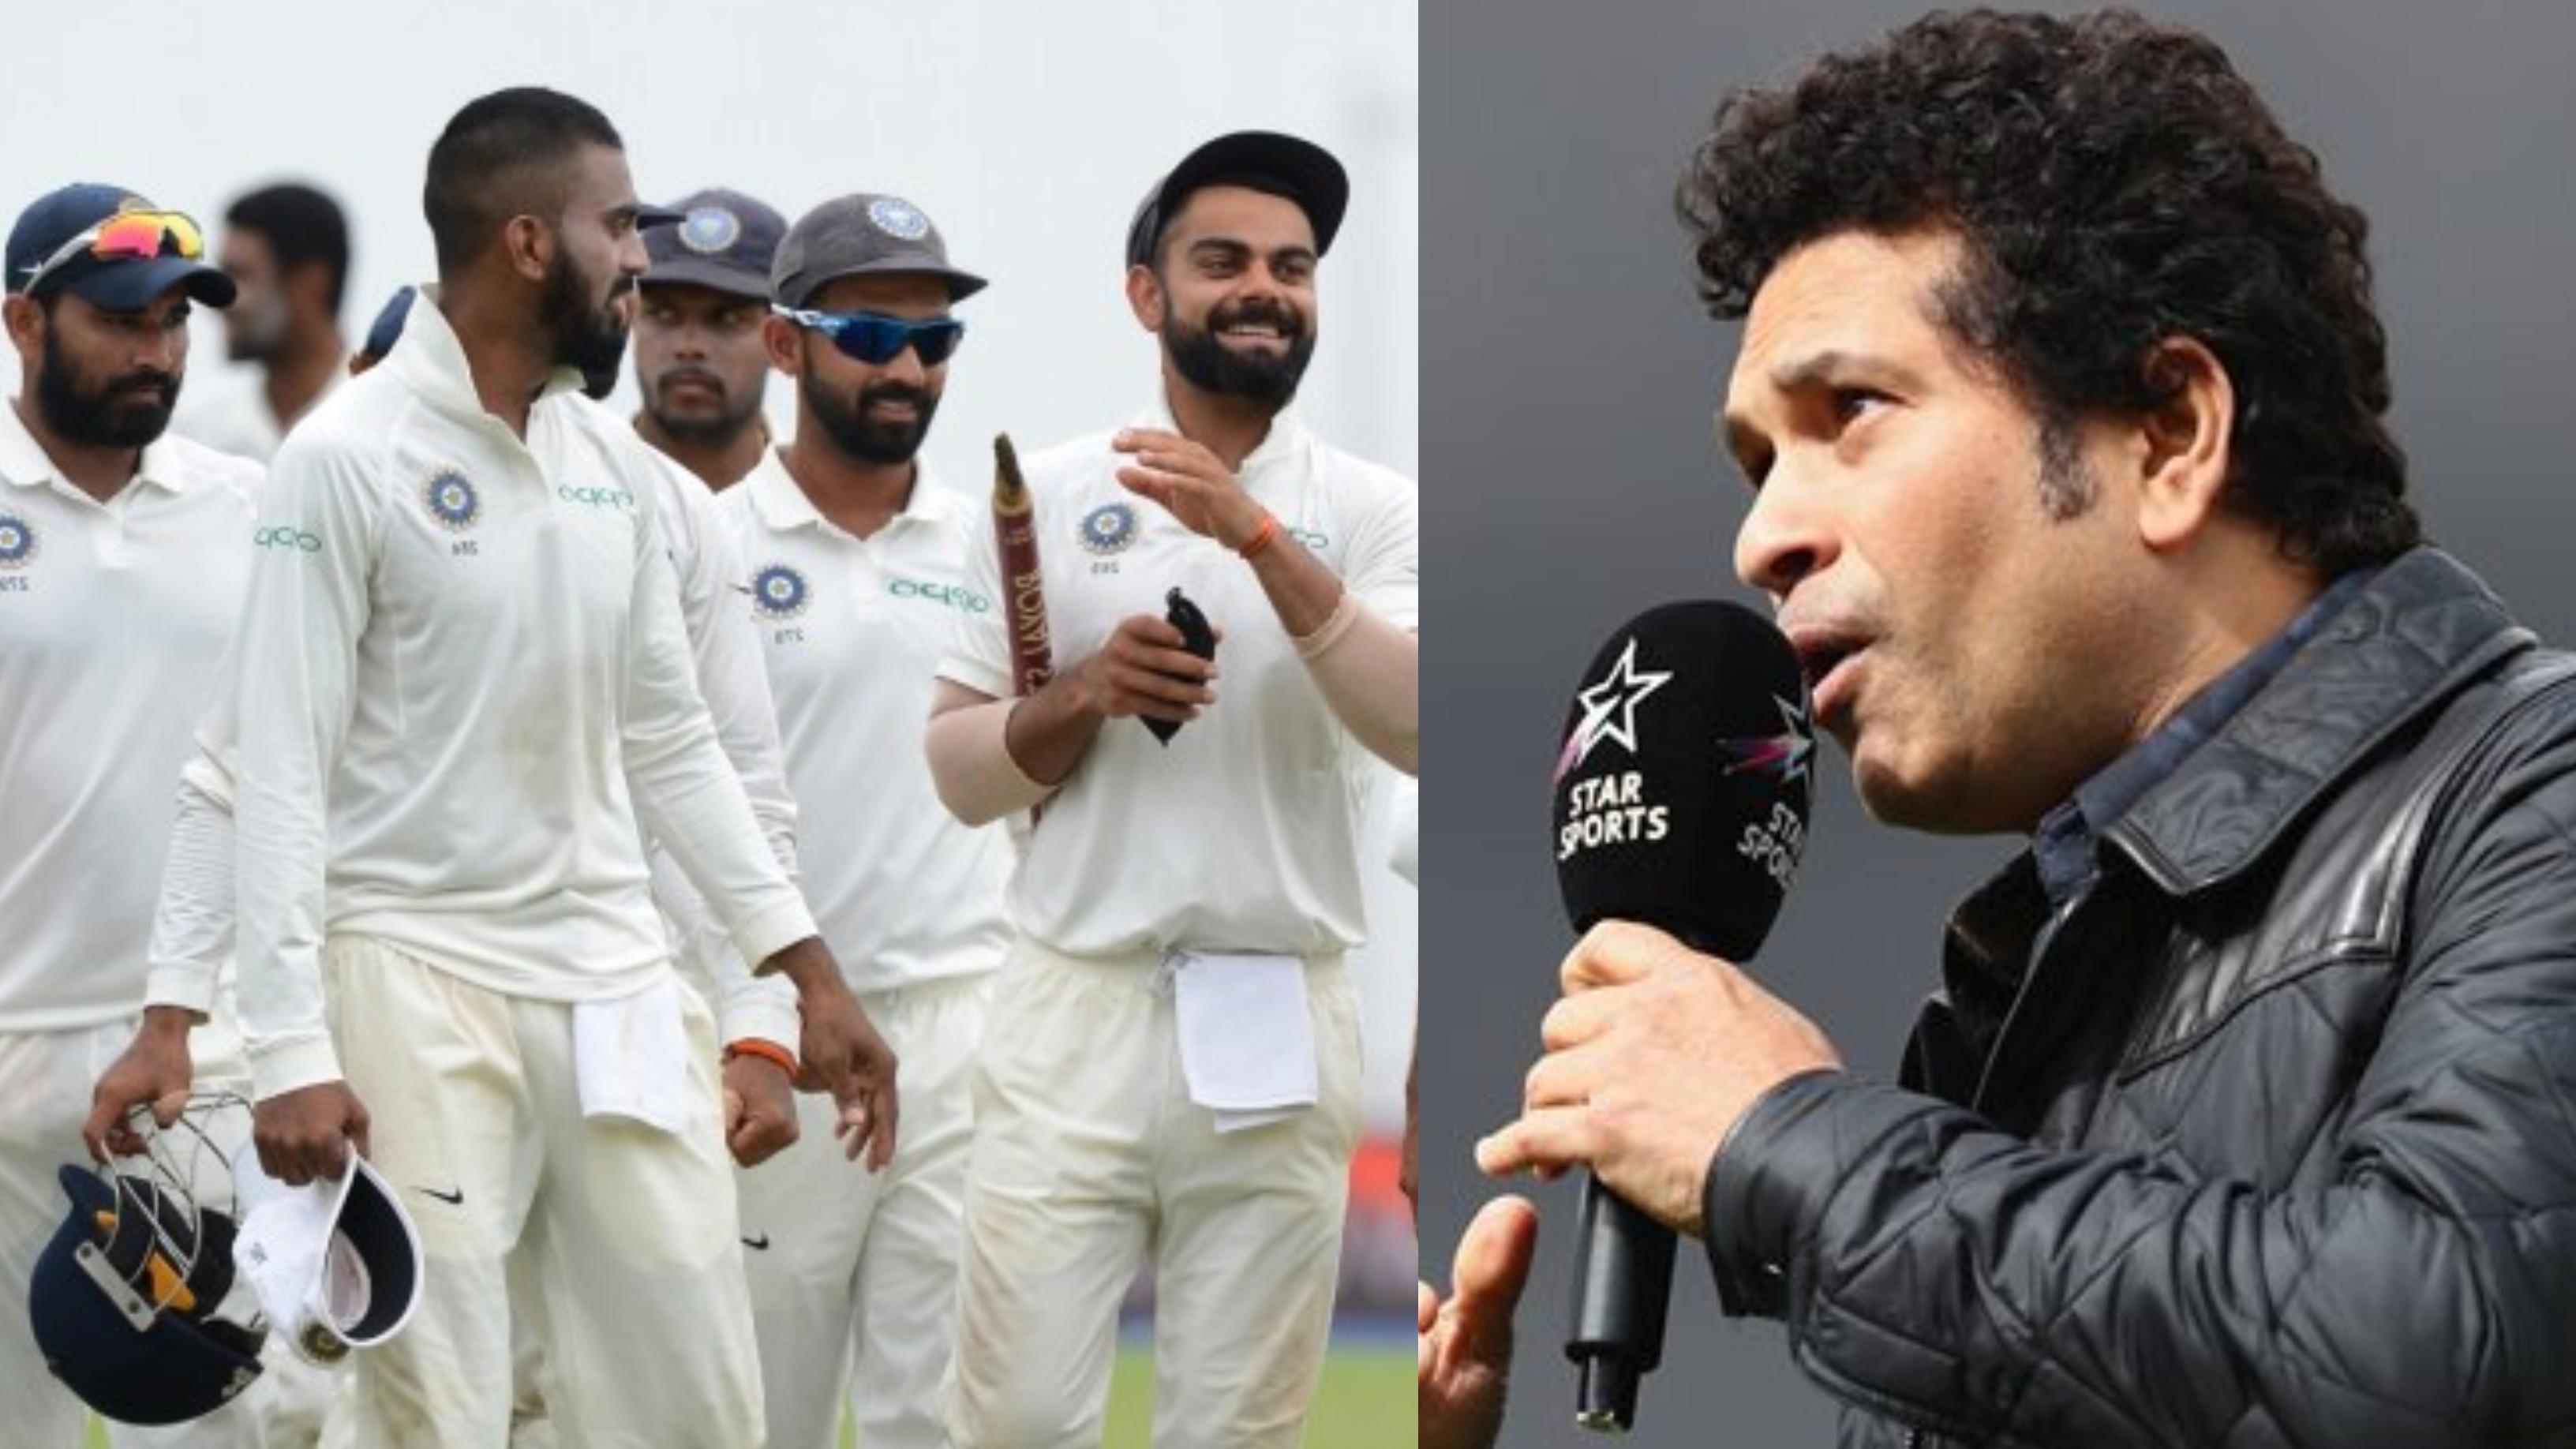 AUS v IND 2018-19: Virat Kohli's team will start Test series with the upper hand, says Sachin Tendulkar